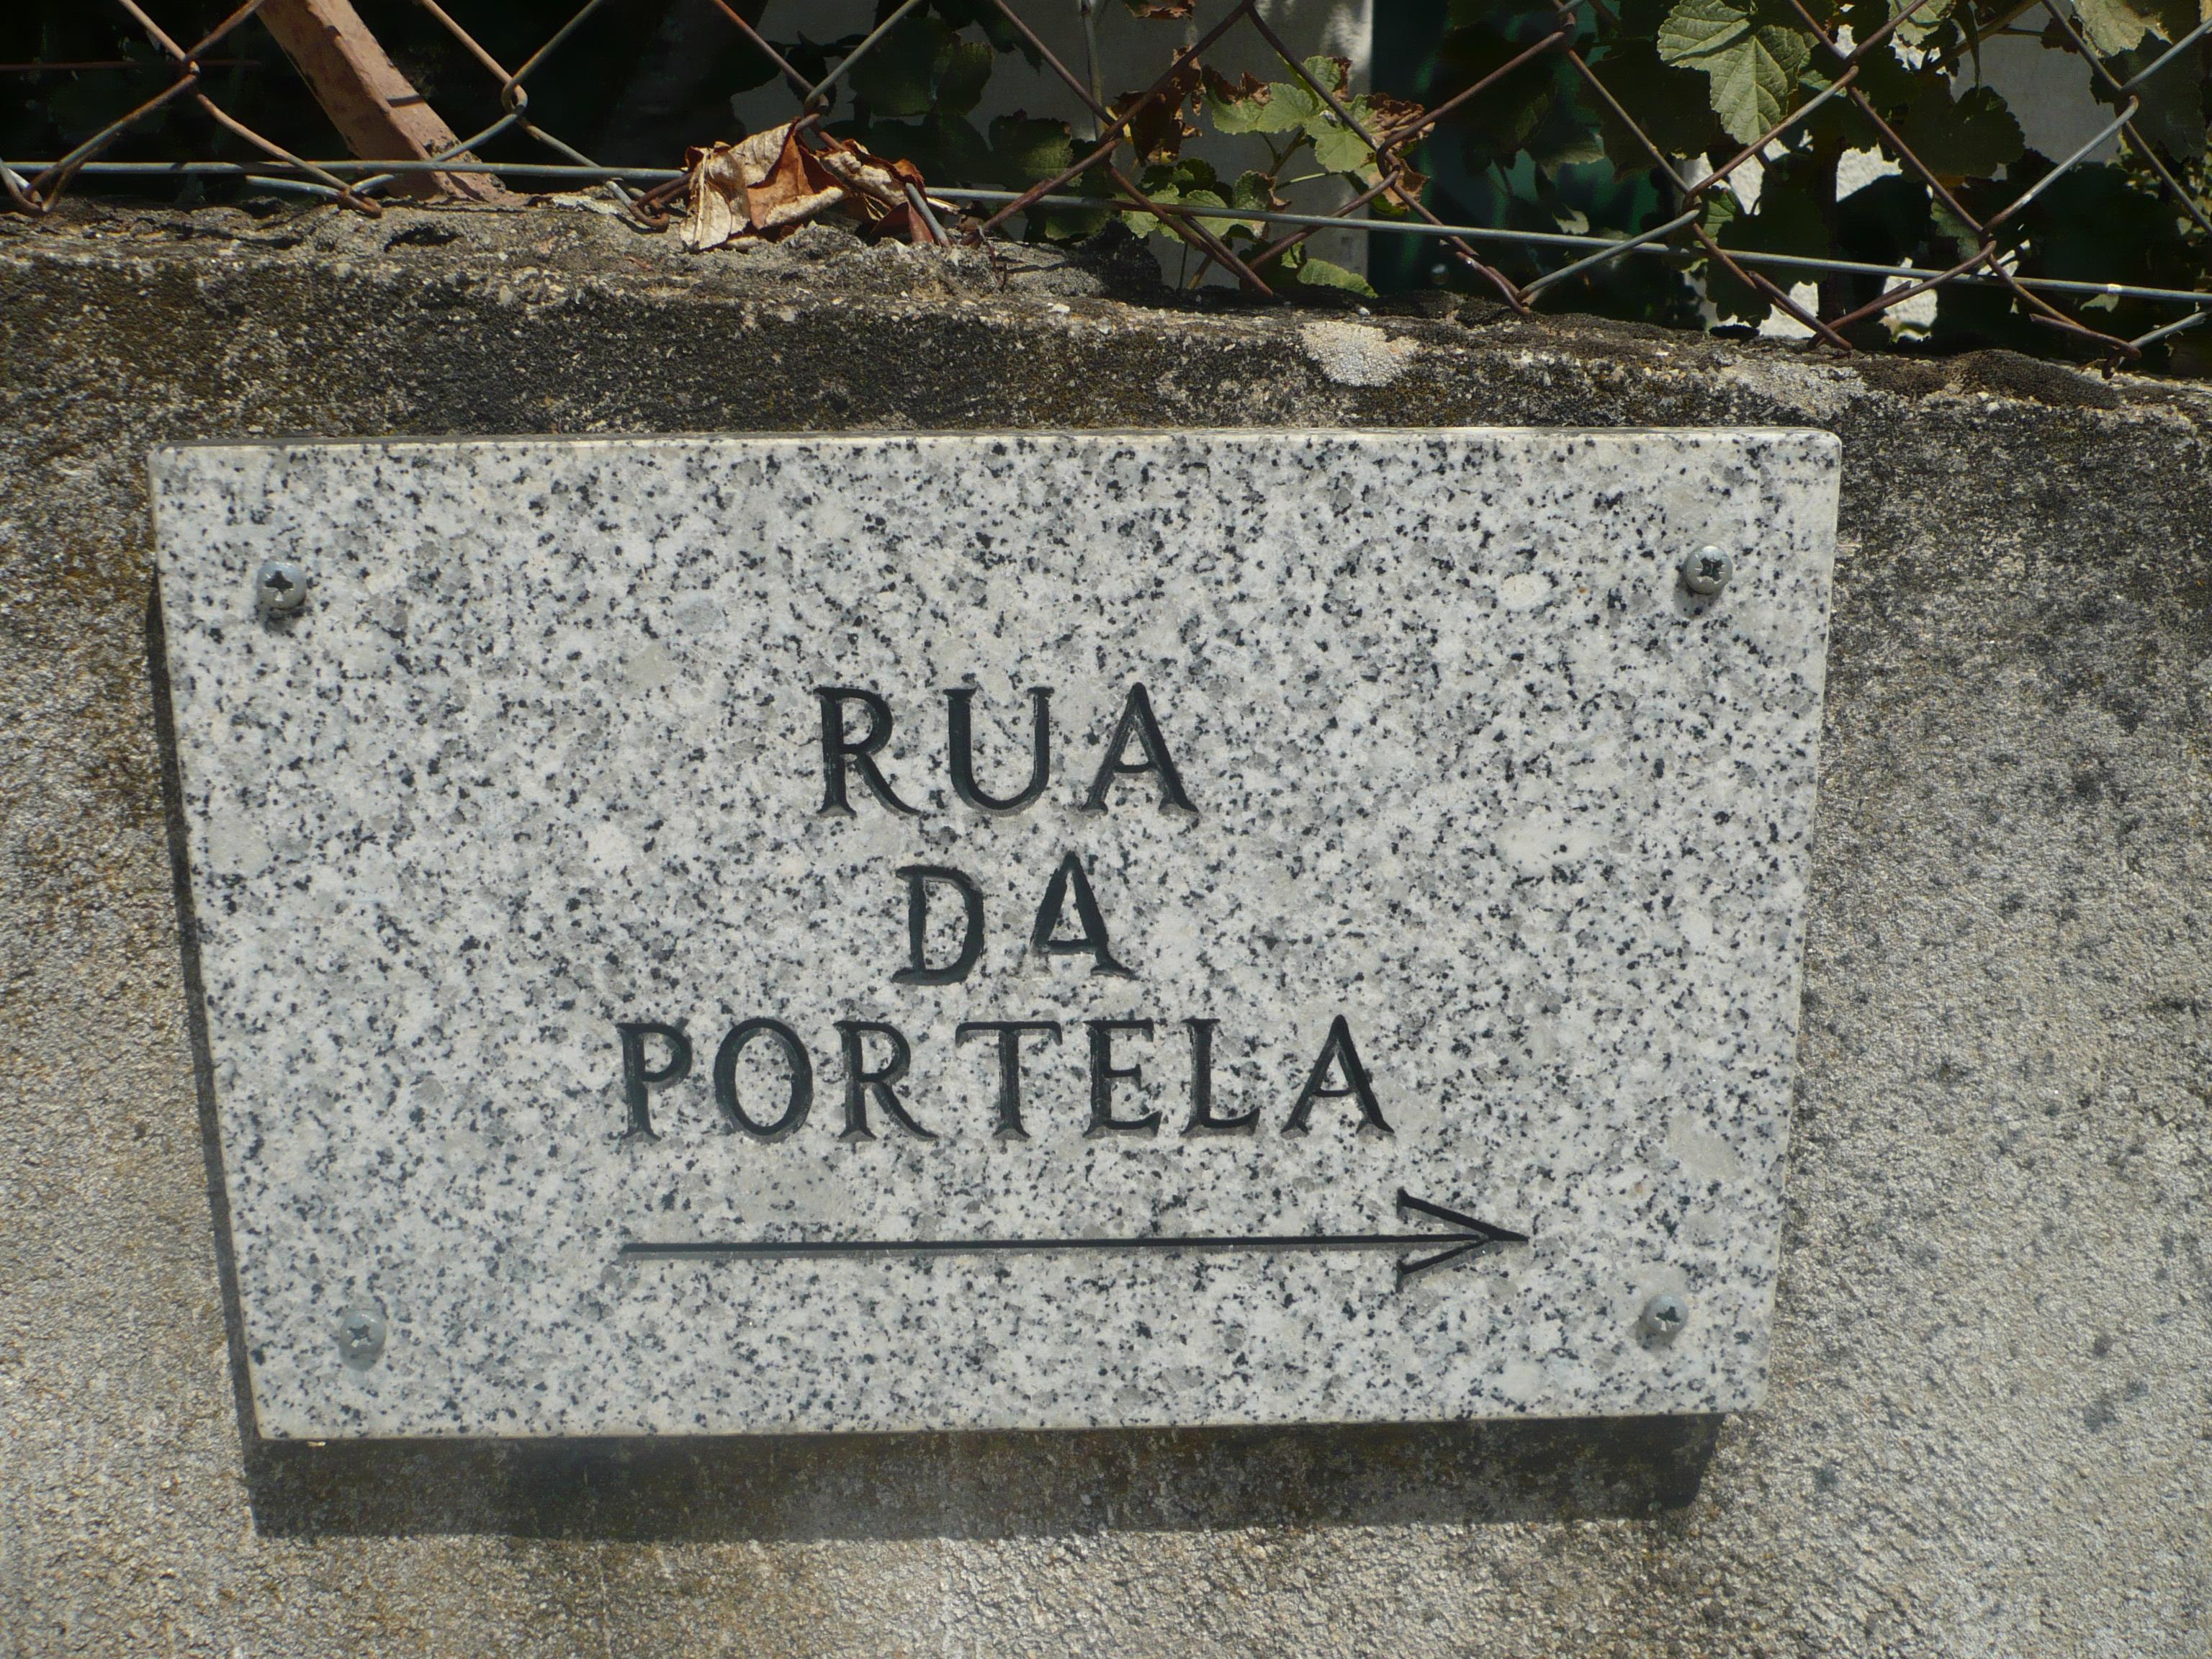 Pin placas de granito marmol vidrio artegrab on pinterest for Placa marmol